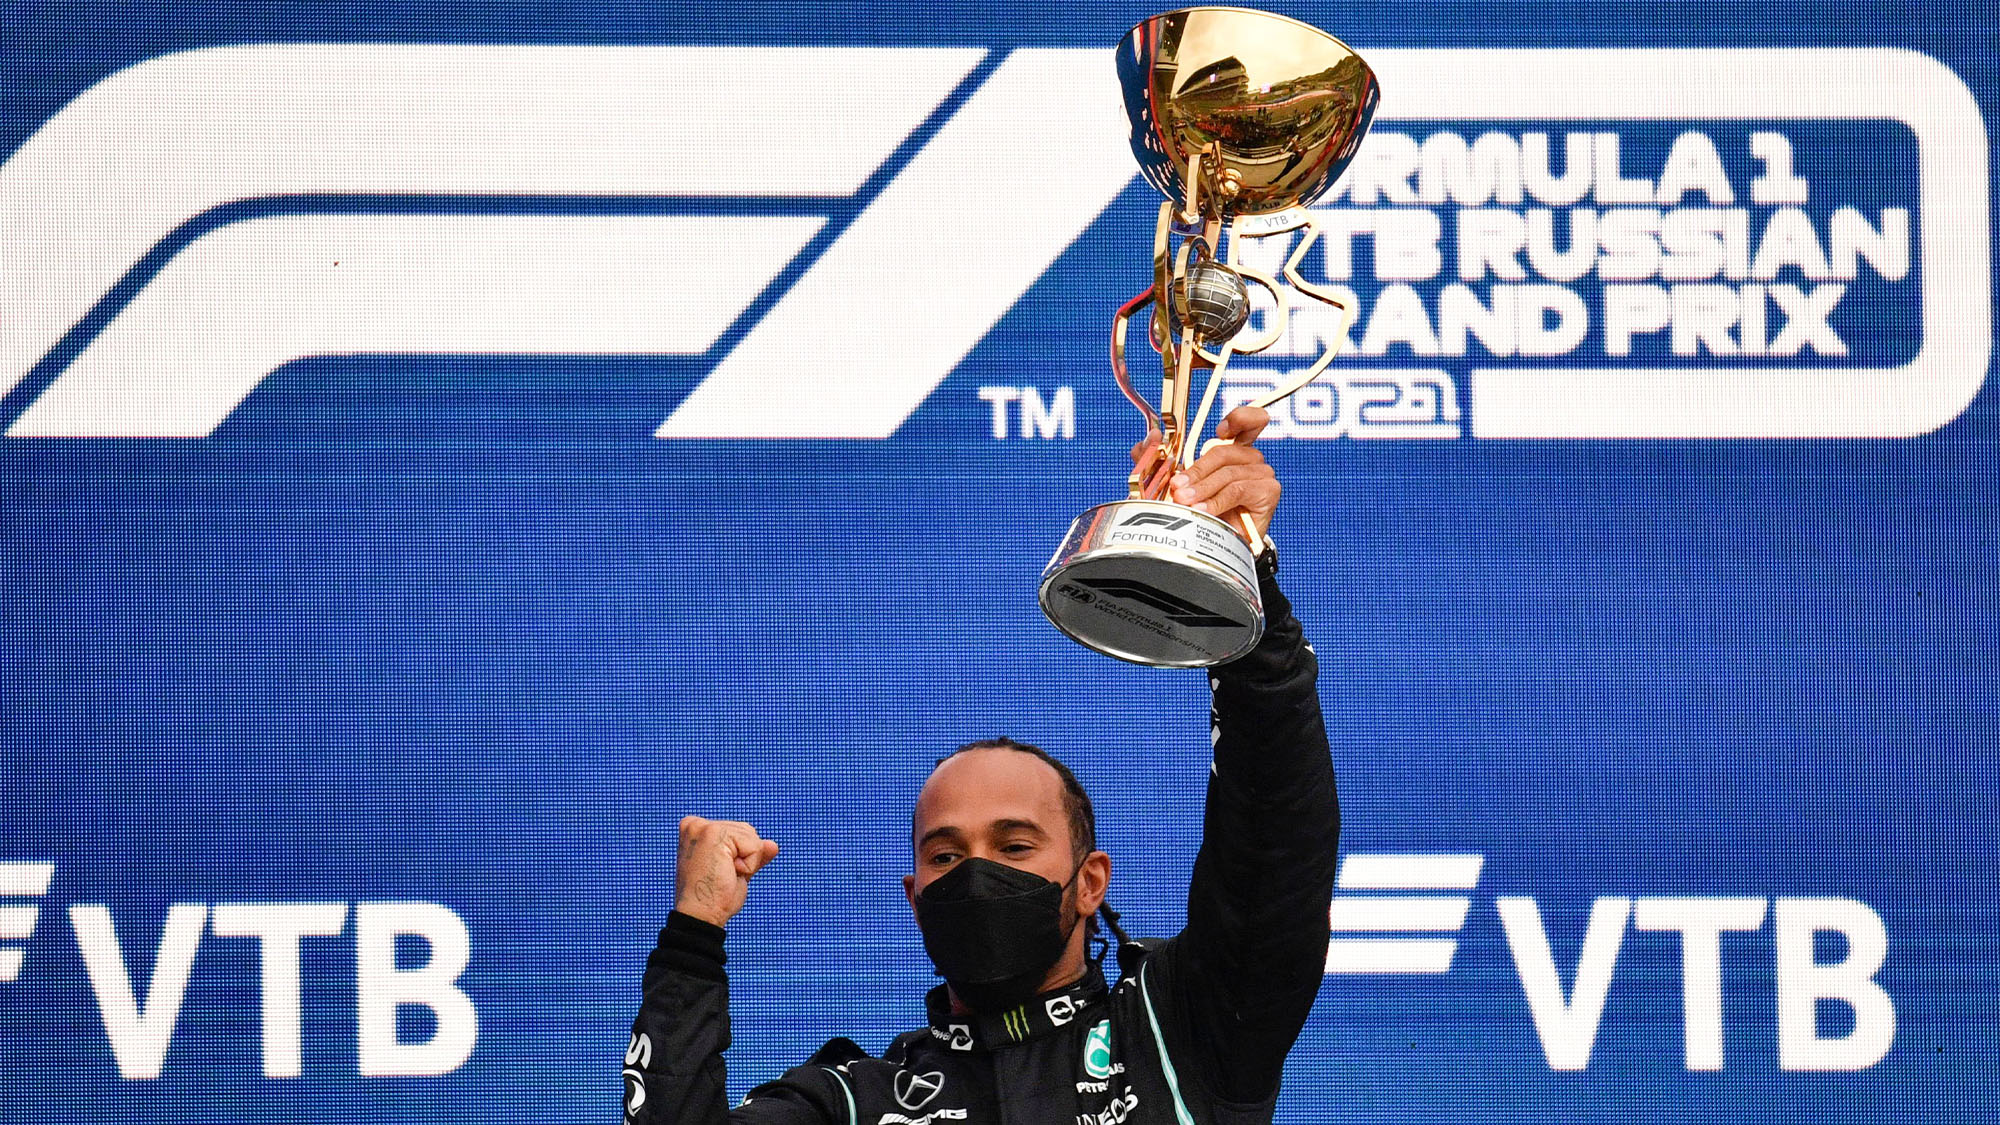 Lewis Hamilton wins 2021 Russian Grand Prix